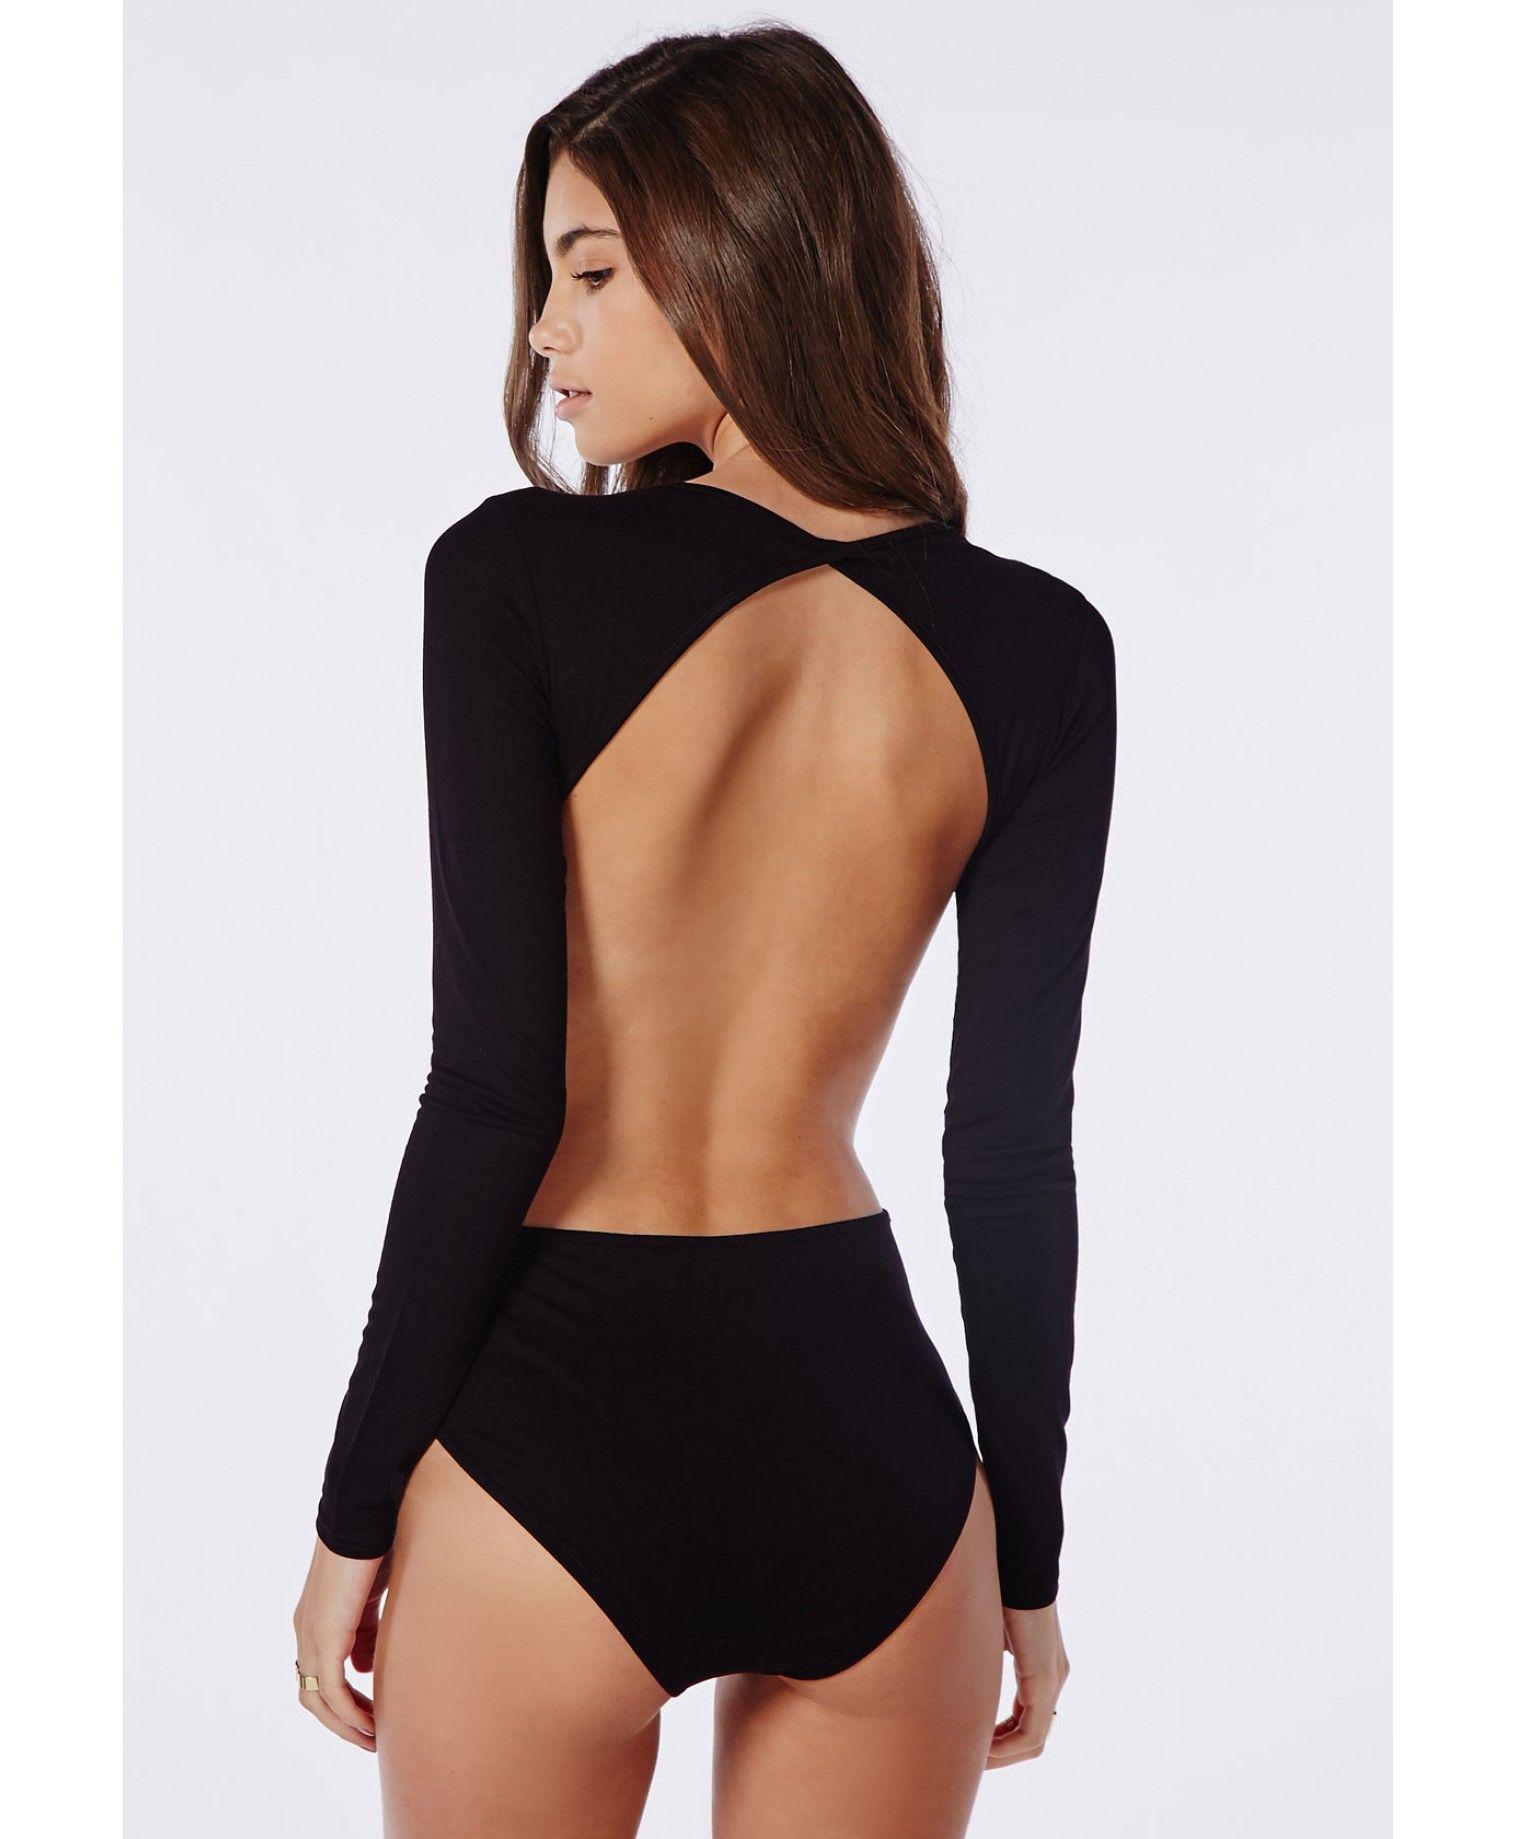 66963e1d10a Long Sleeve Backless Bodysuit Black - Tops - Bodysuits - Missguided ...